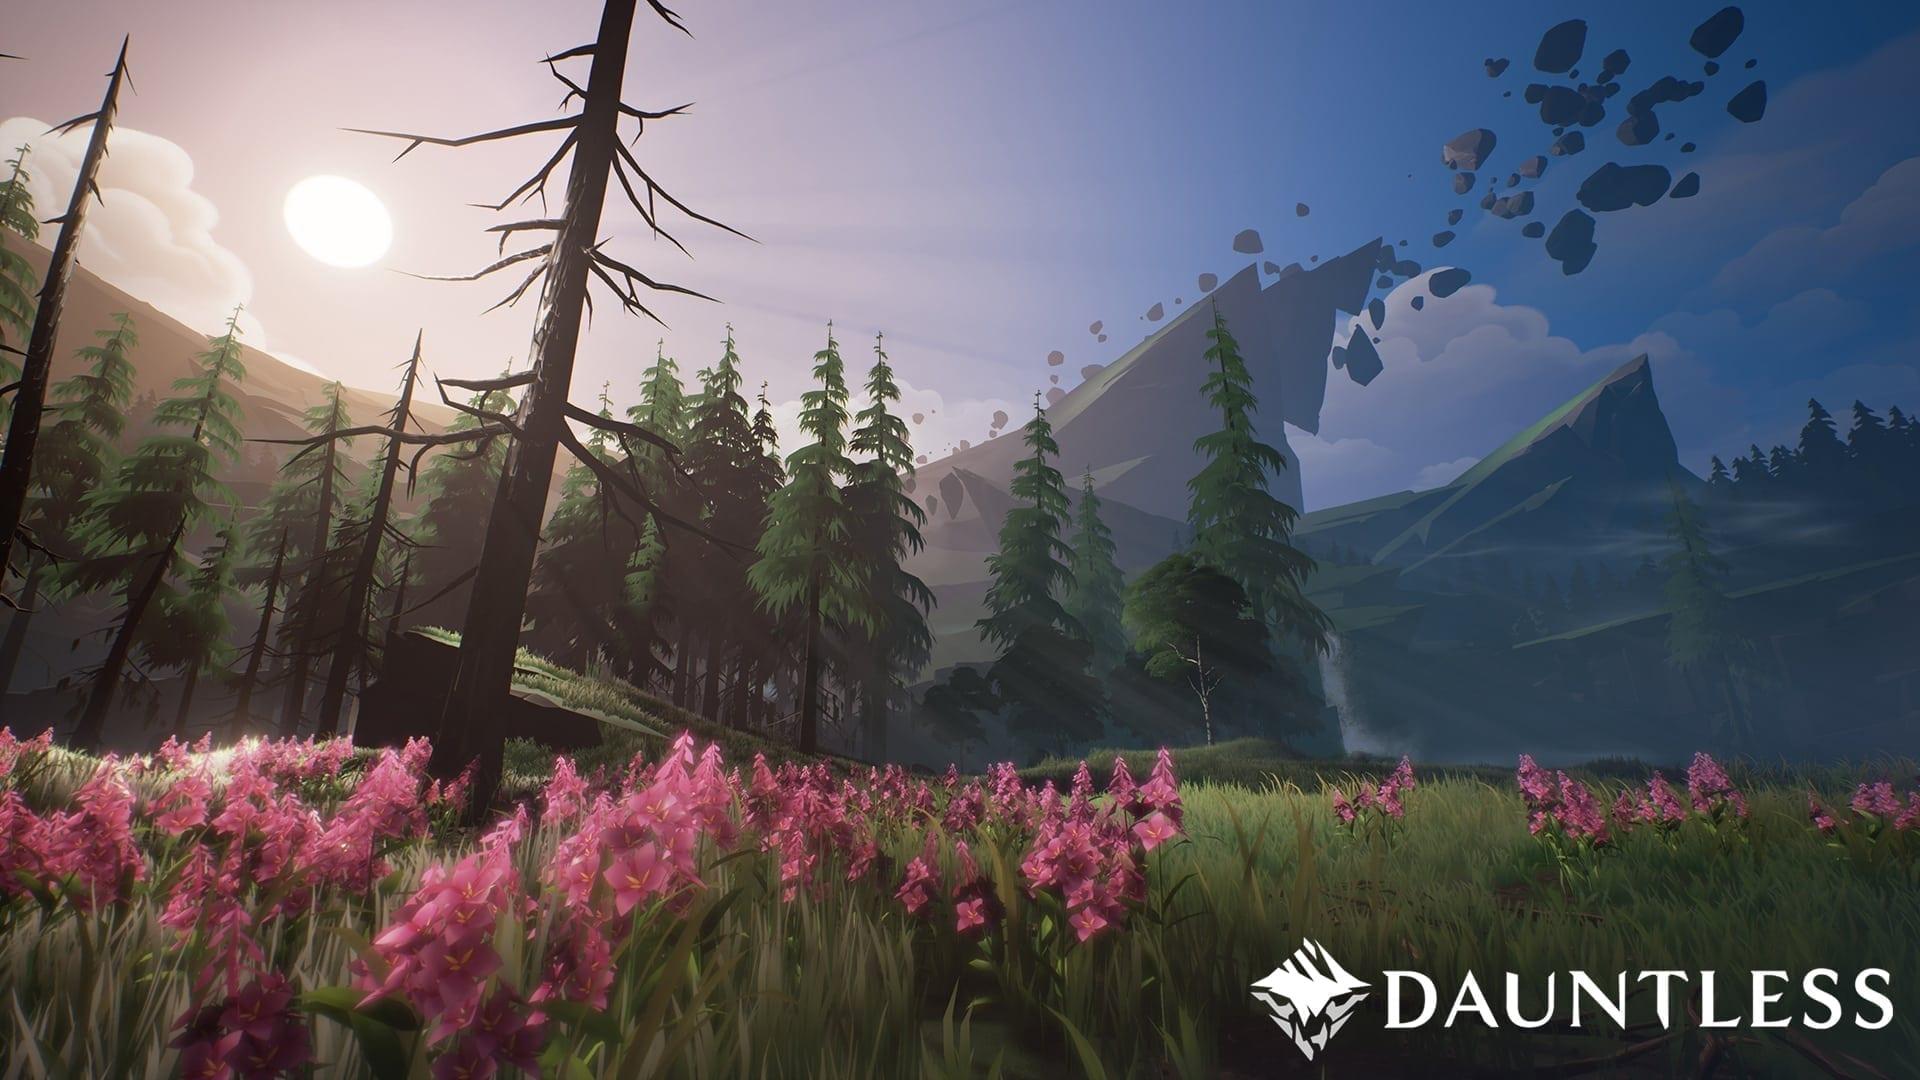 dauntless-game-screenshot-3